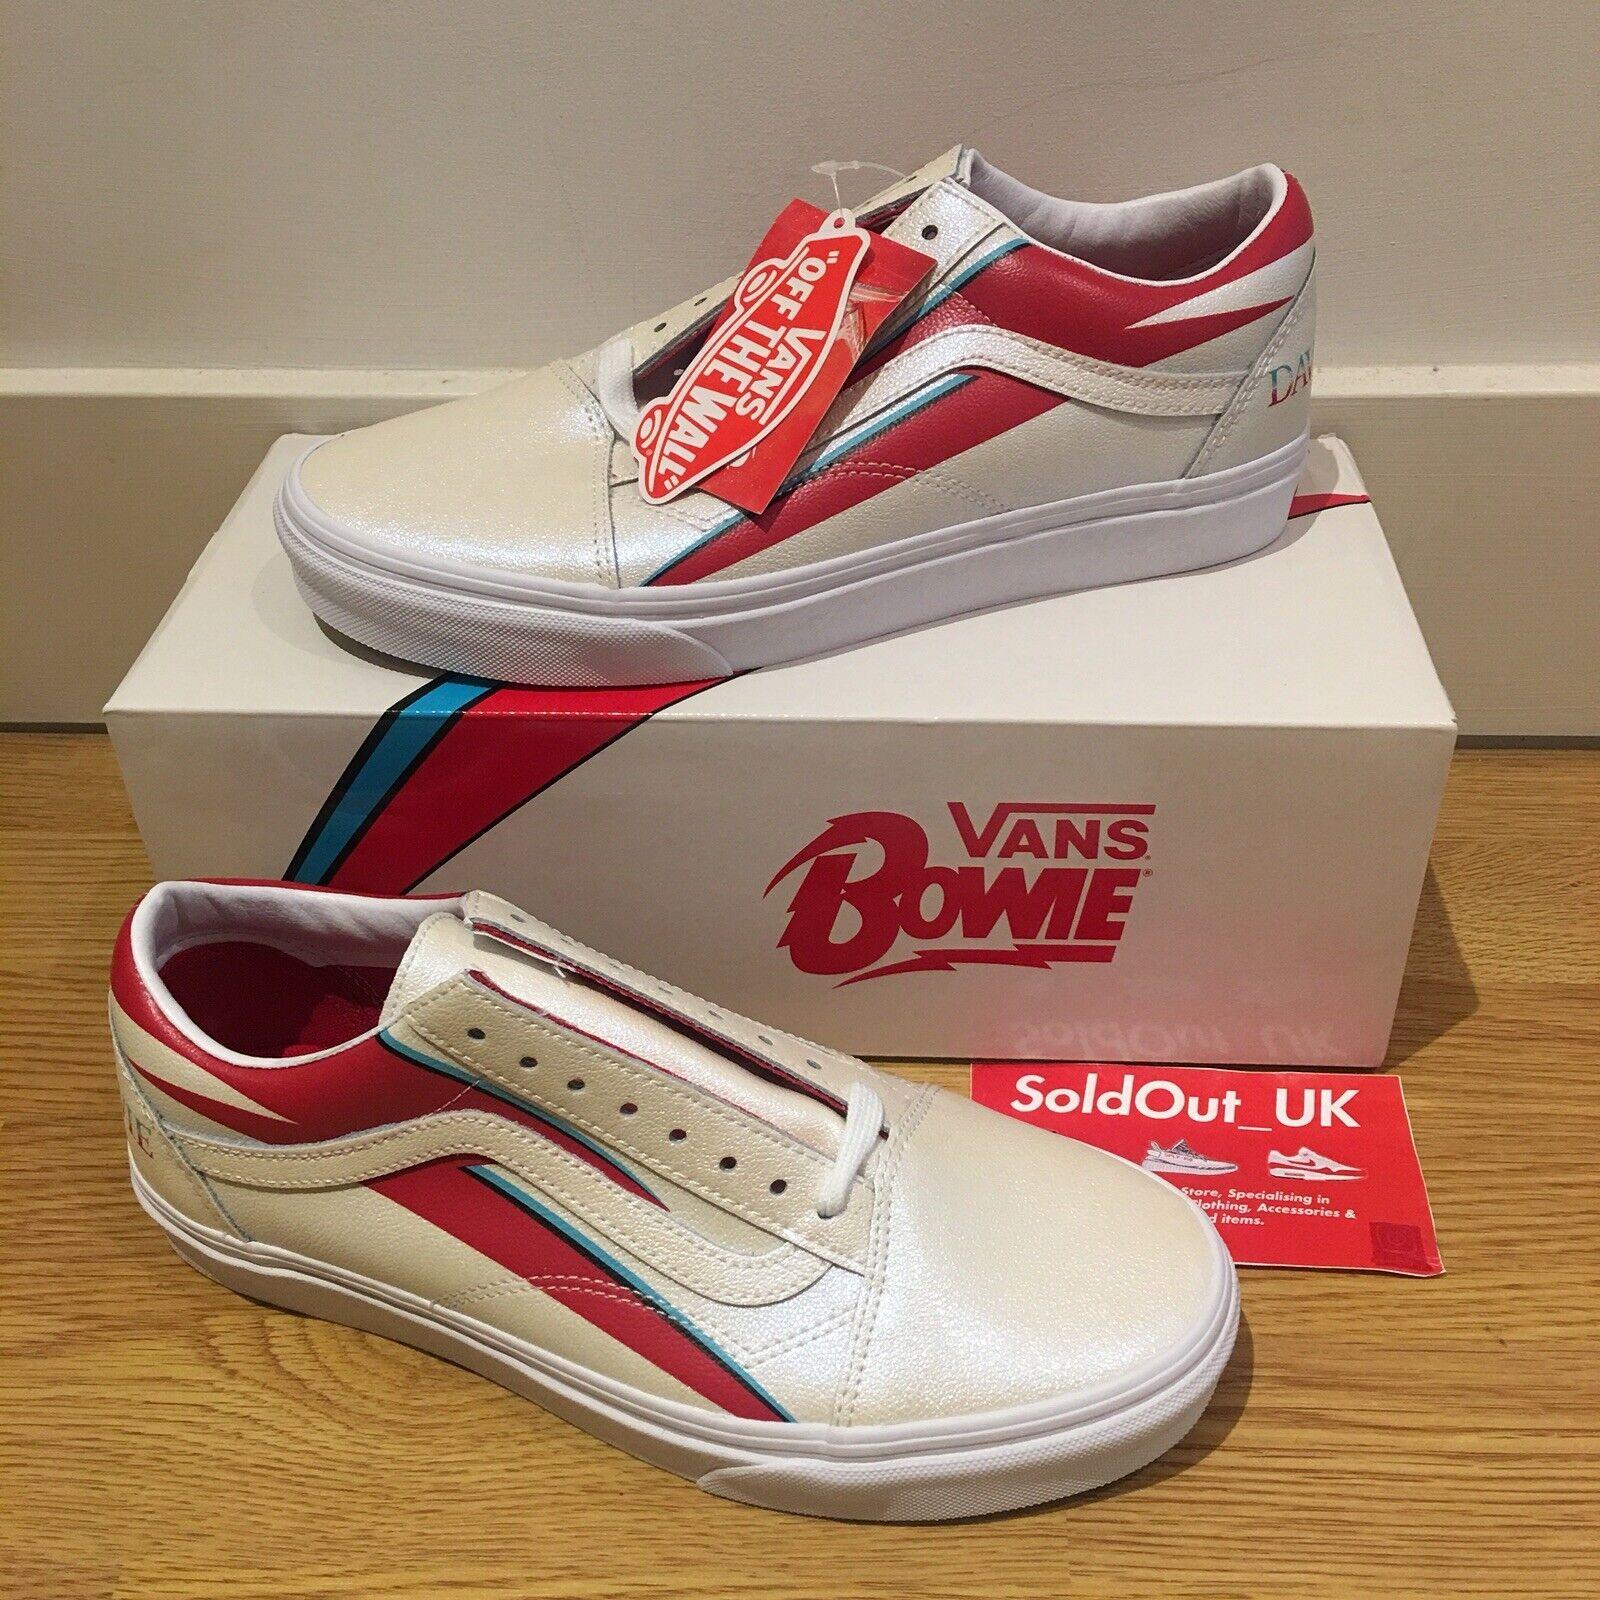 Vans x David Bowie Old Skool scarpe da ginnastica    BIANCO ROSSO  UK7 US8  Deadstock  bc38d4